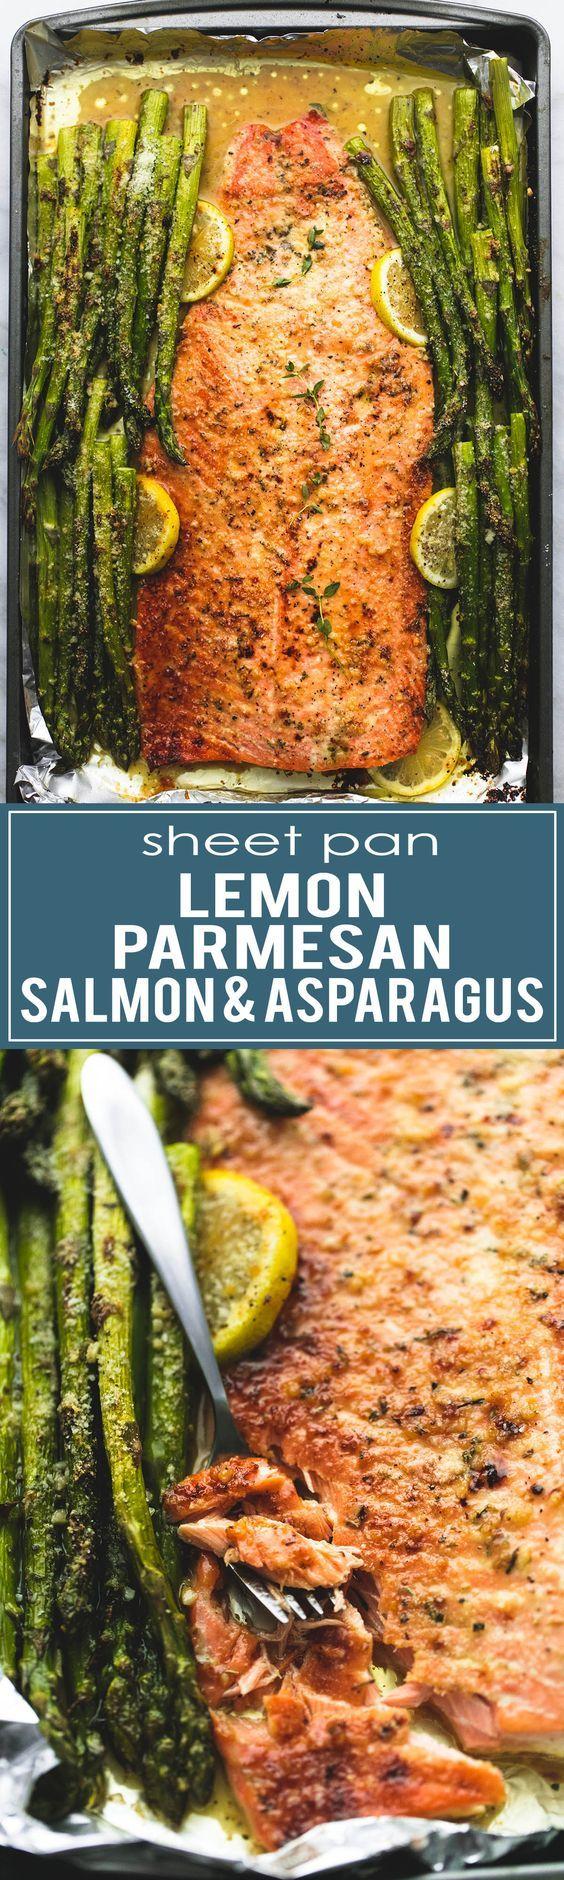 No Bake: Baked Lemon Parmesan Salmon & Asparagus in Foil - ...